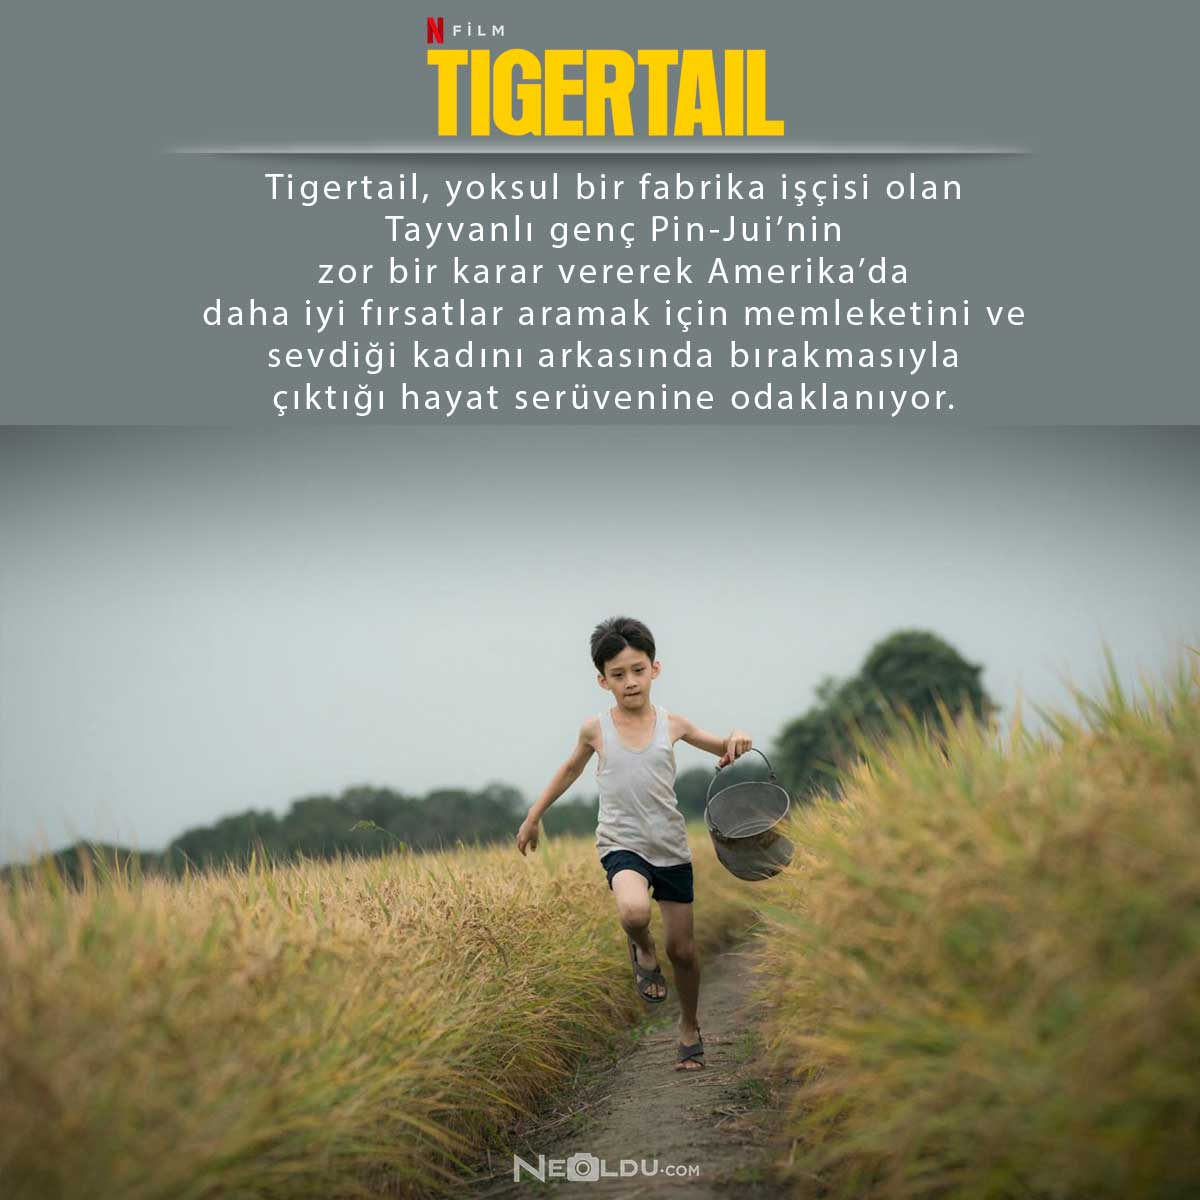 tigertail-filmi-hakkinda-bilgi.jpg